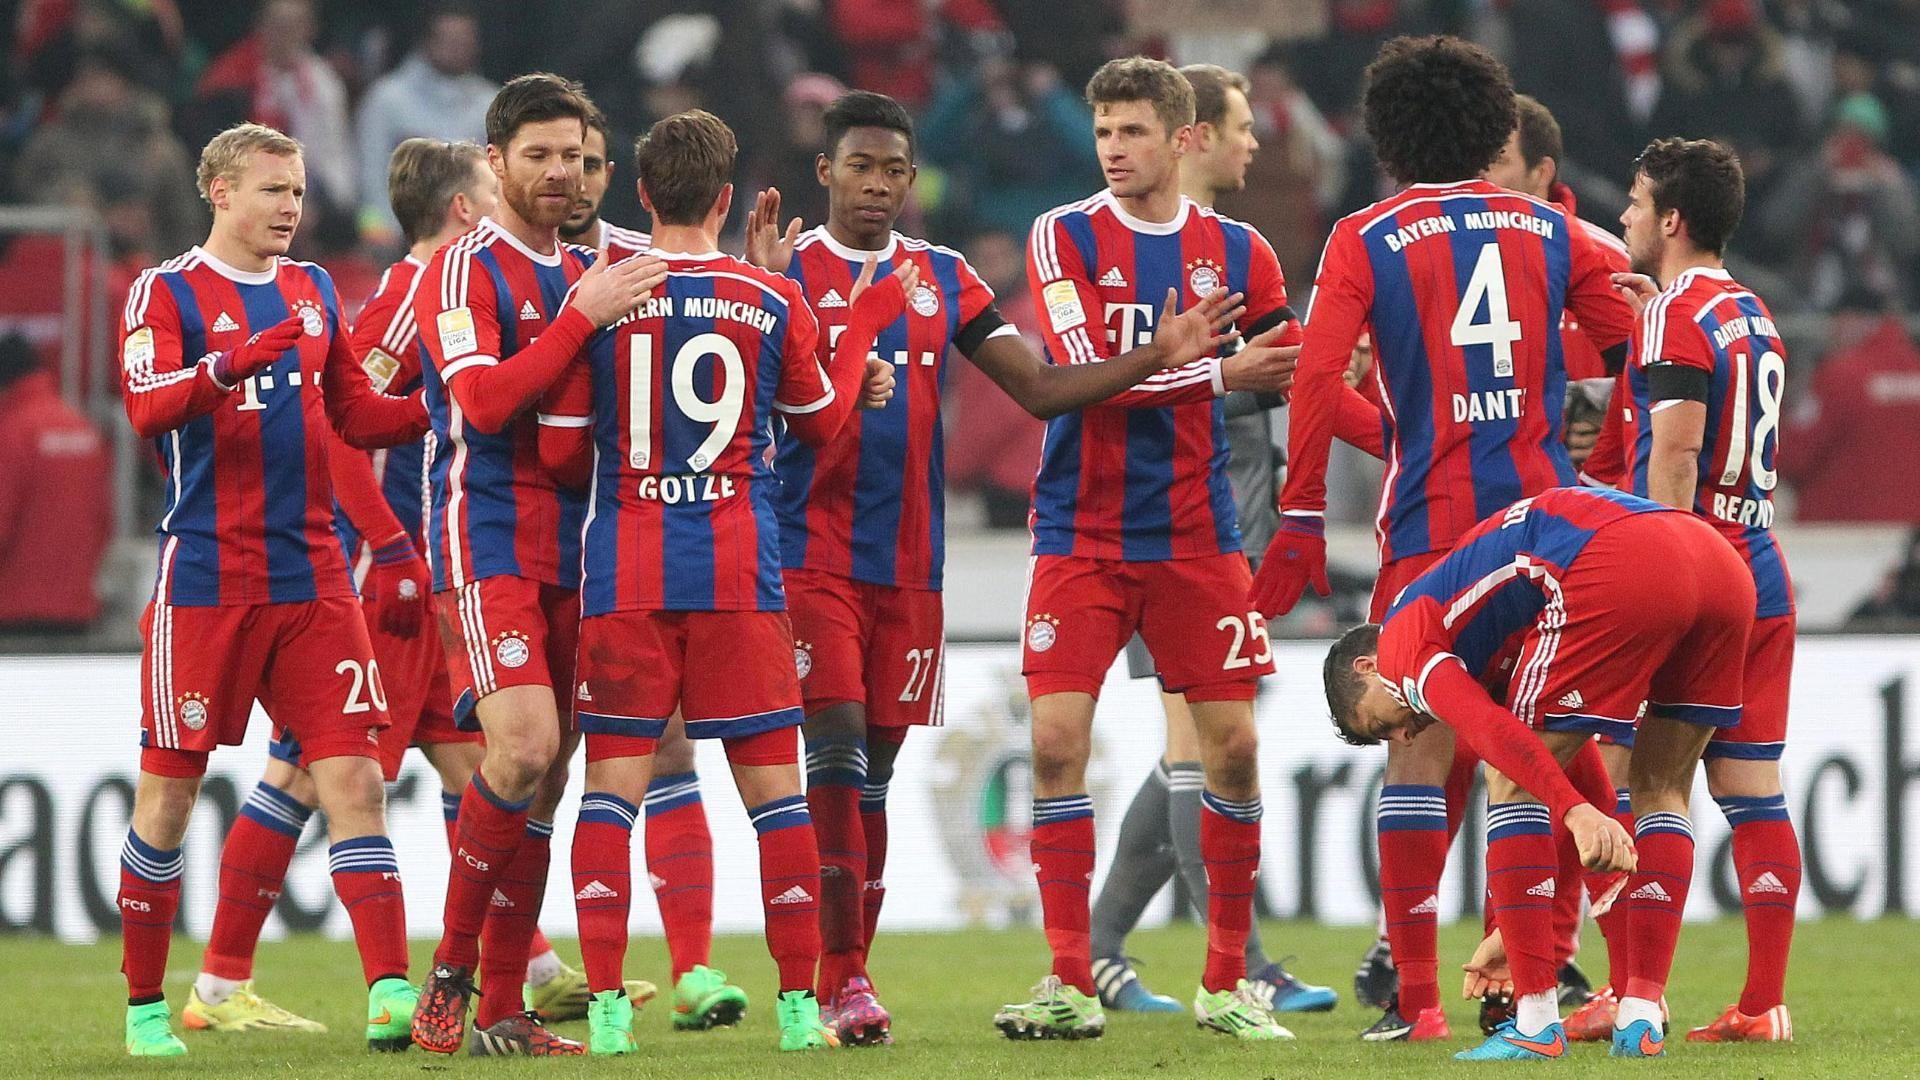 Liga Jerman  - Bayern Munich Jauh Lebih Kuat Ketimbang Real Madrid Dan Barcelona